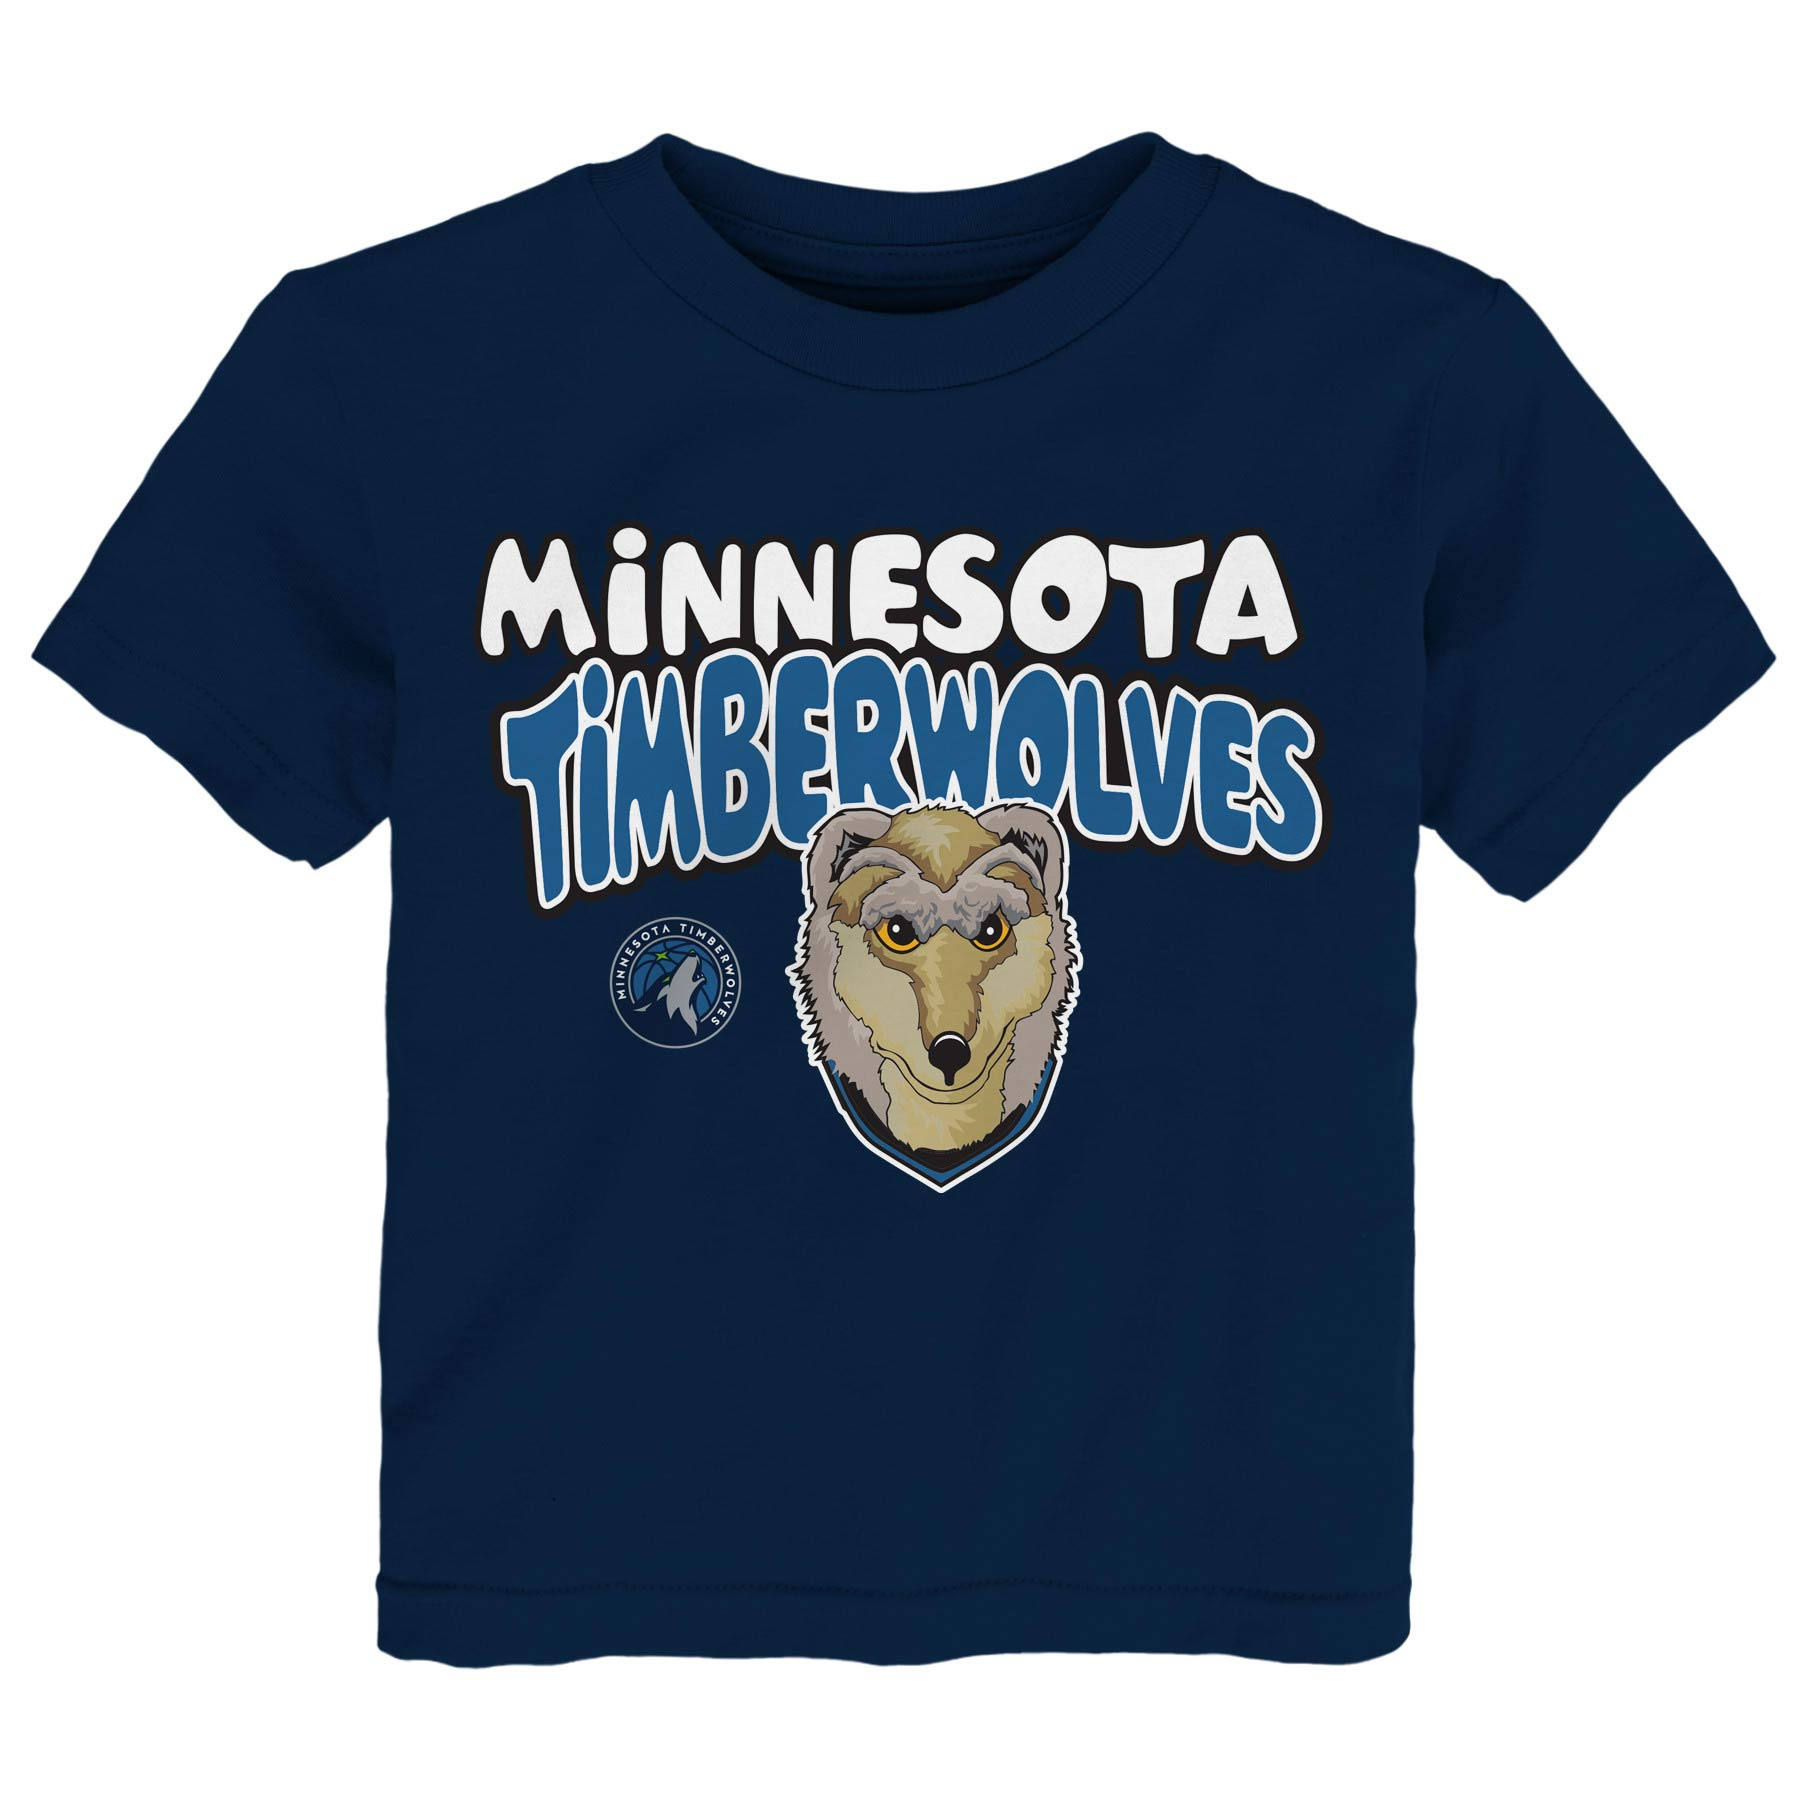 Minnesota Timberwolves Preschool & Toddler Bubble Letter T-Shirt - Navy